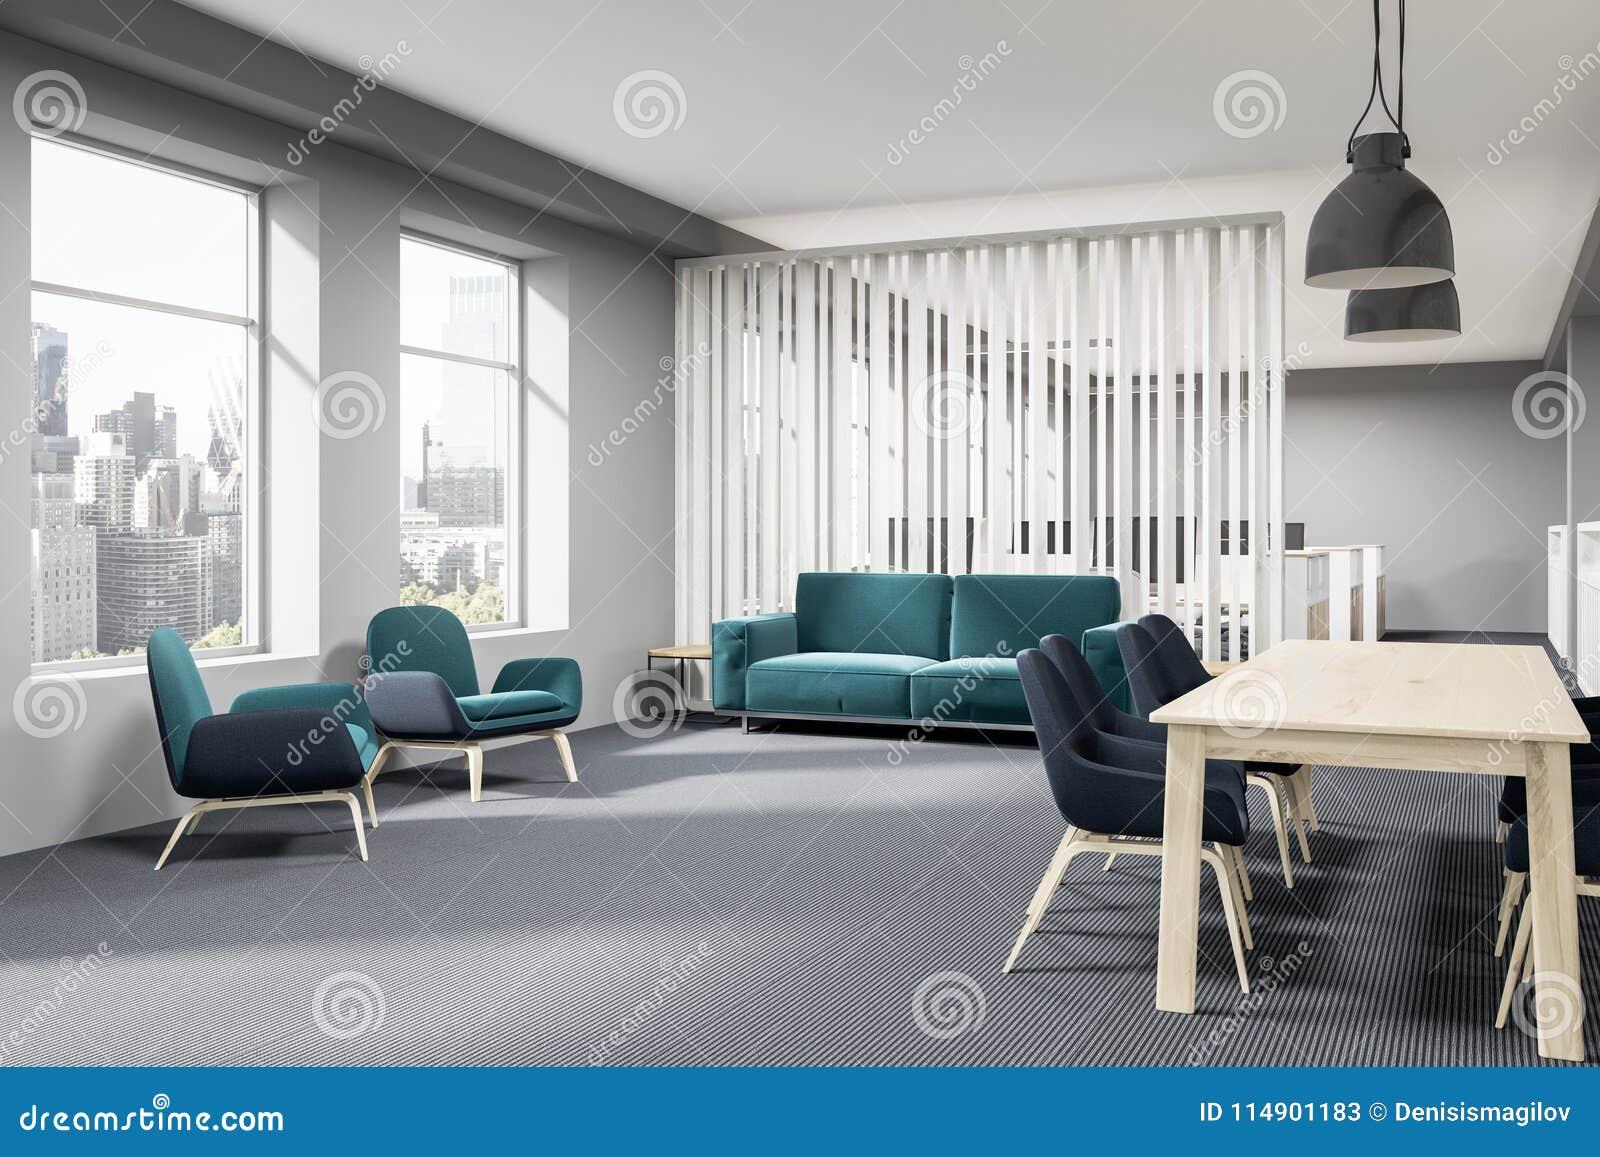 Blue Sofa Office Waiting Room Corner Stock Illustration